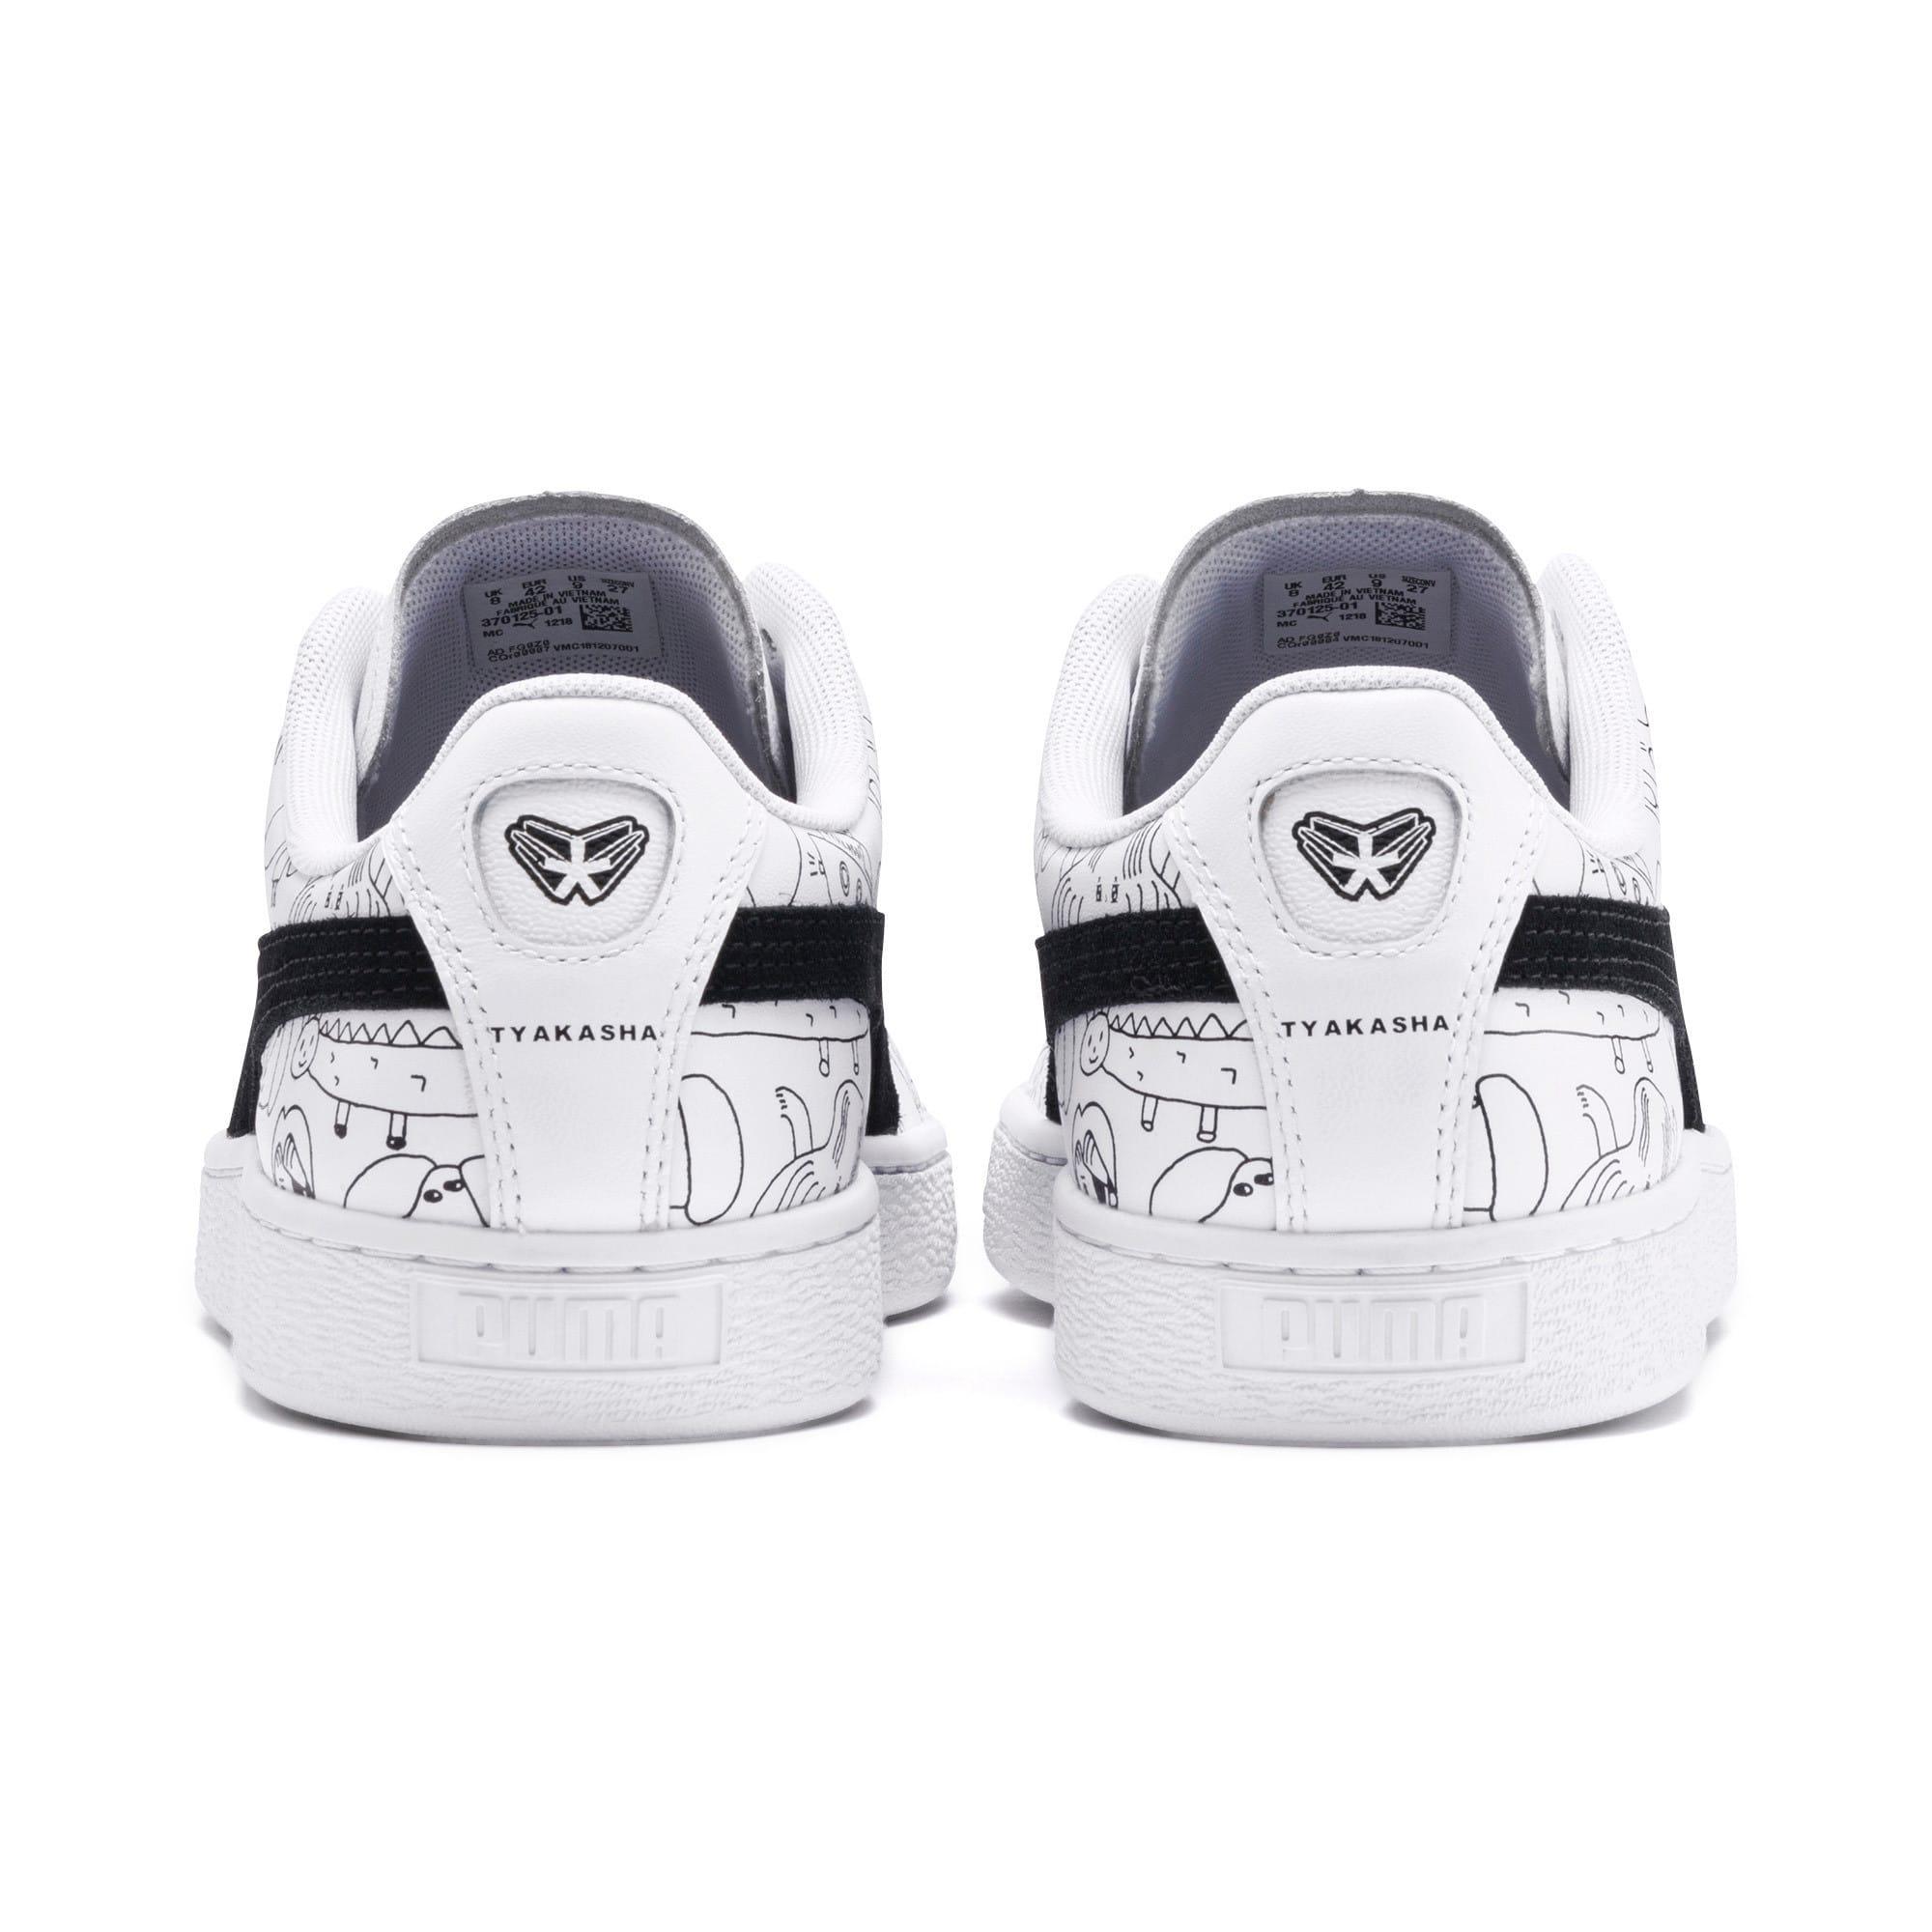 Thumbnail 5 of PUMA x TYAKASHA Basket Sneakers, Puma White-Puma Black, medium